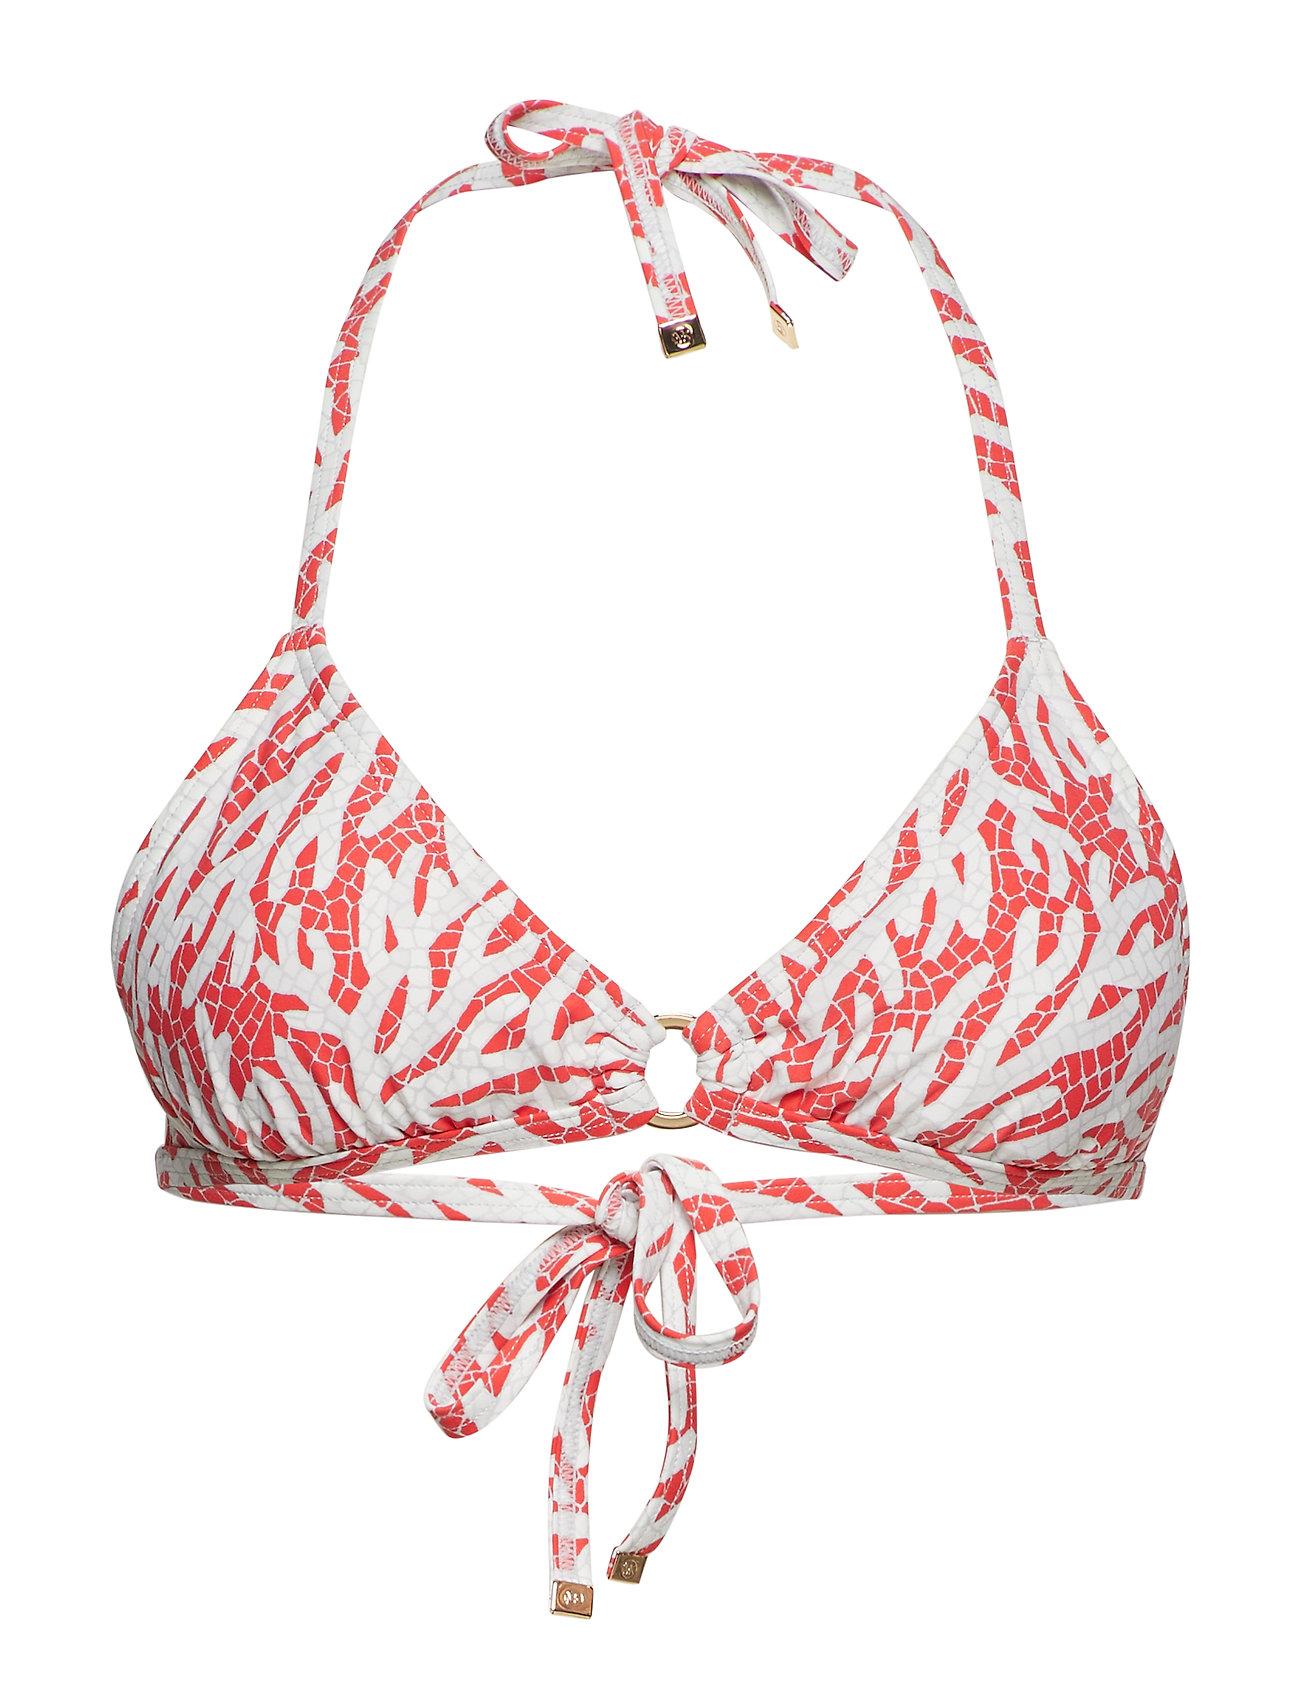 Michael Kors Swimwear TRIANGLE TOP - SEA CORAL